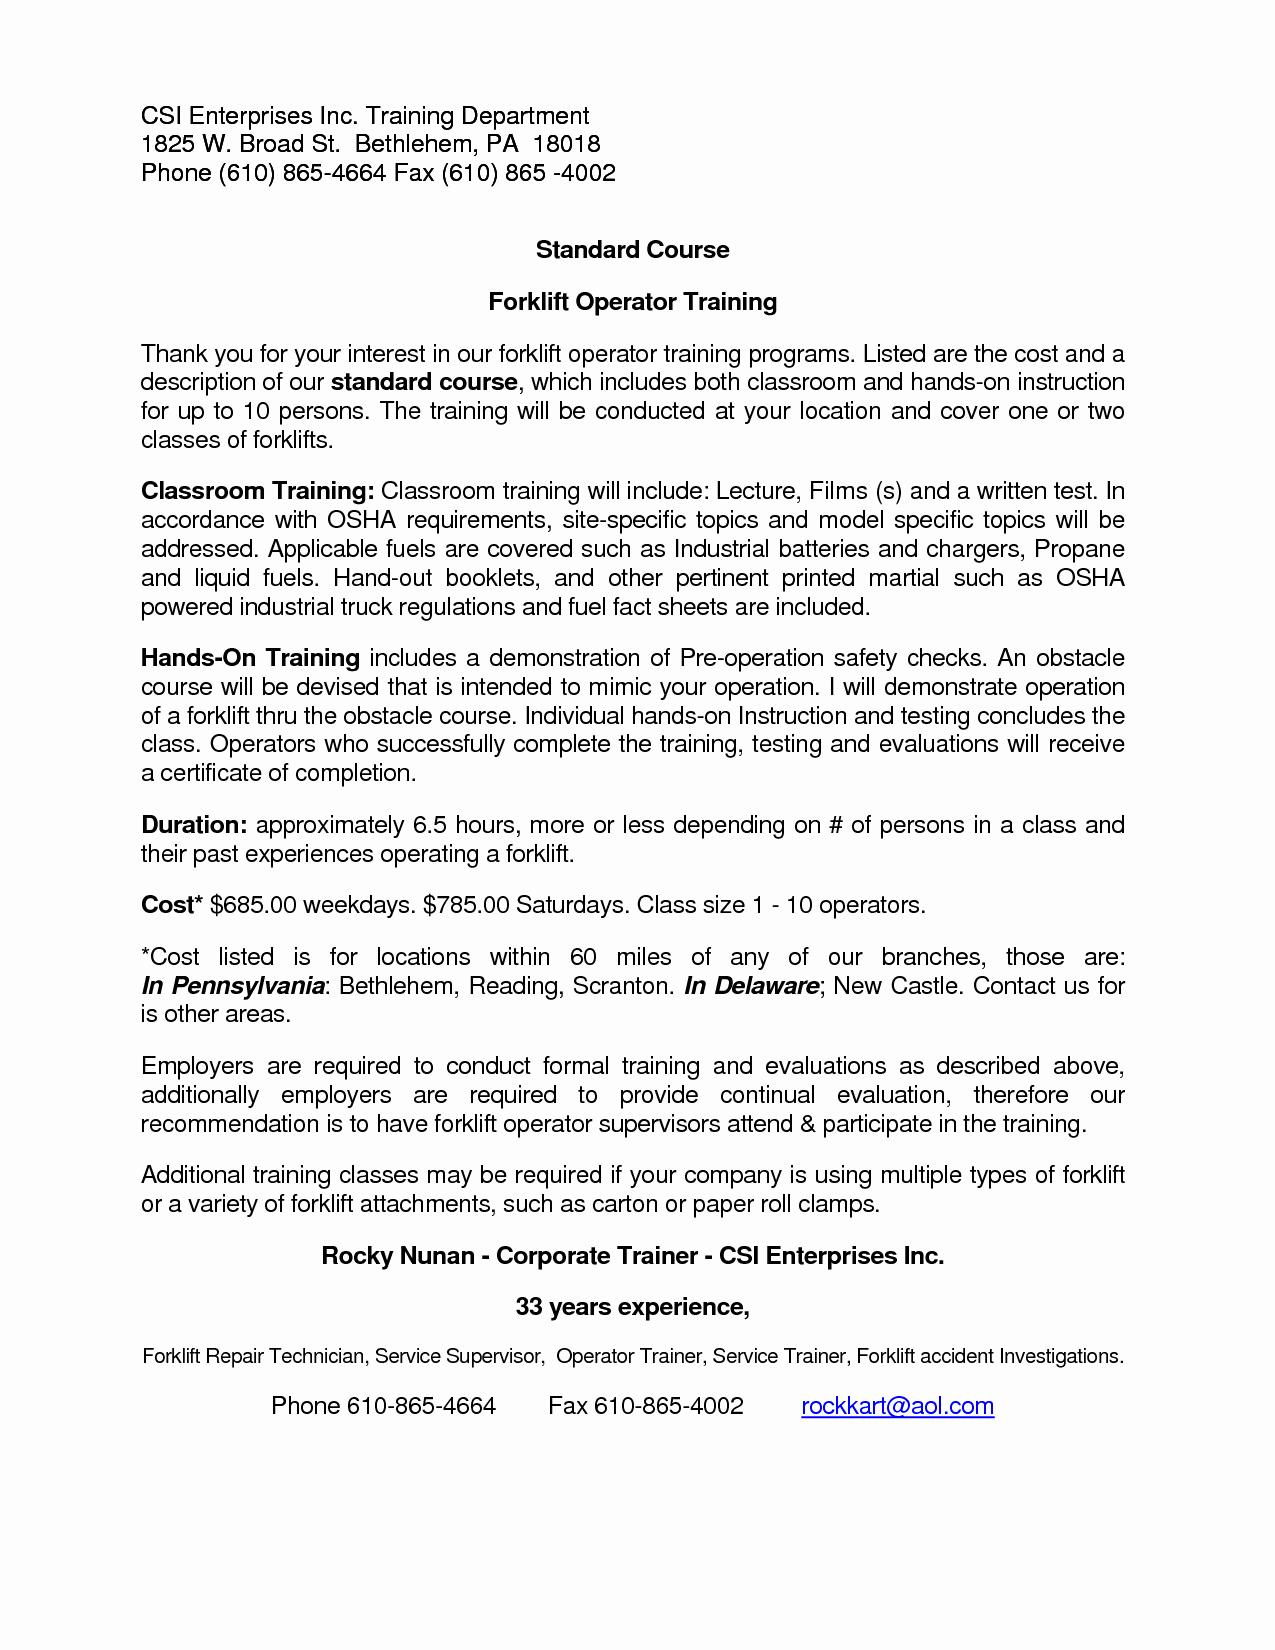 Forklift Operator Resume format